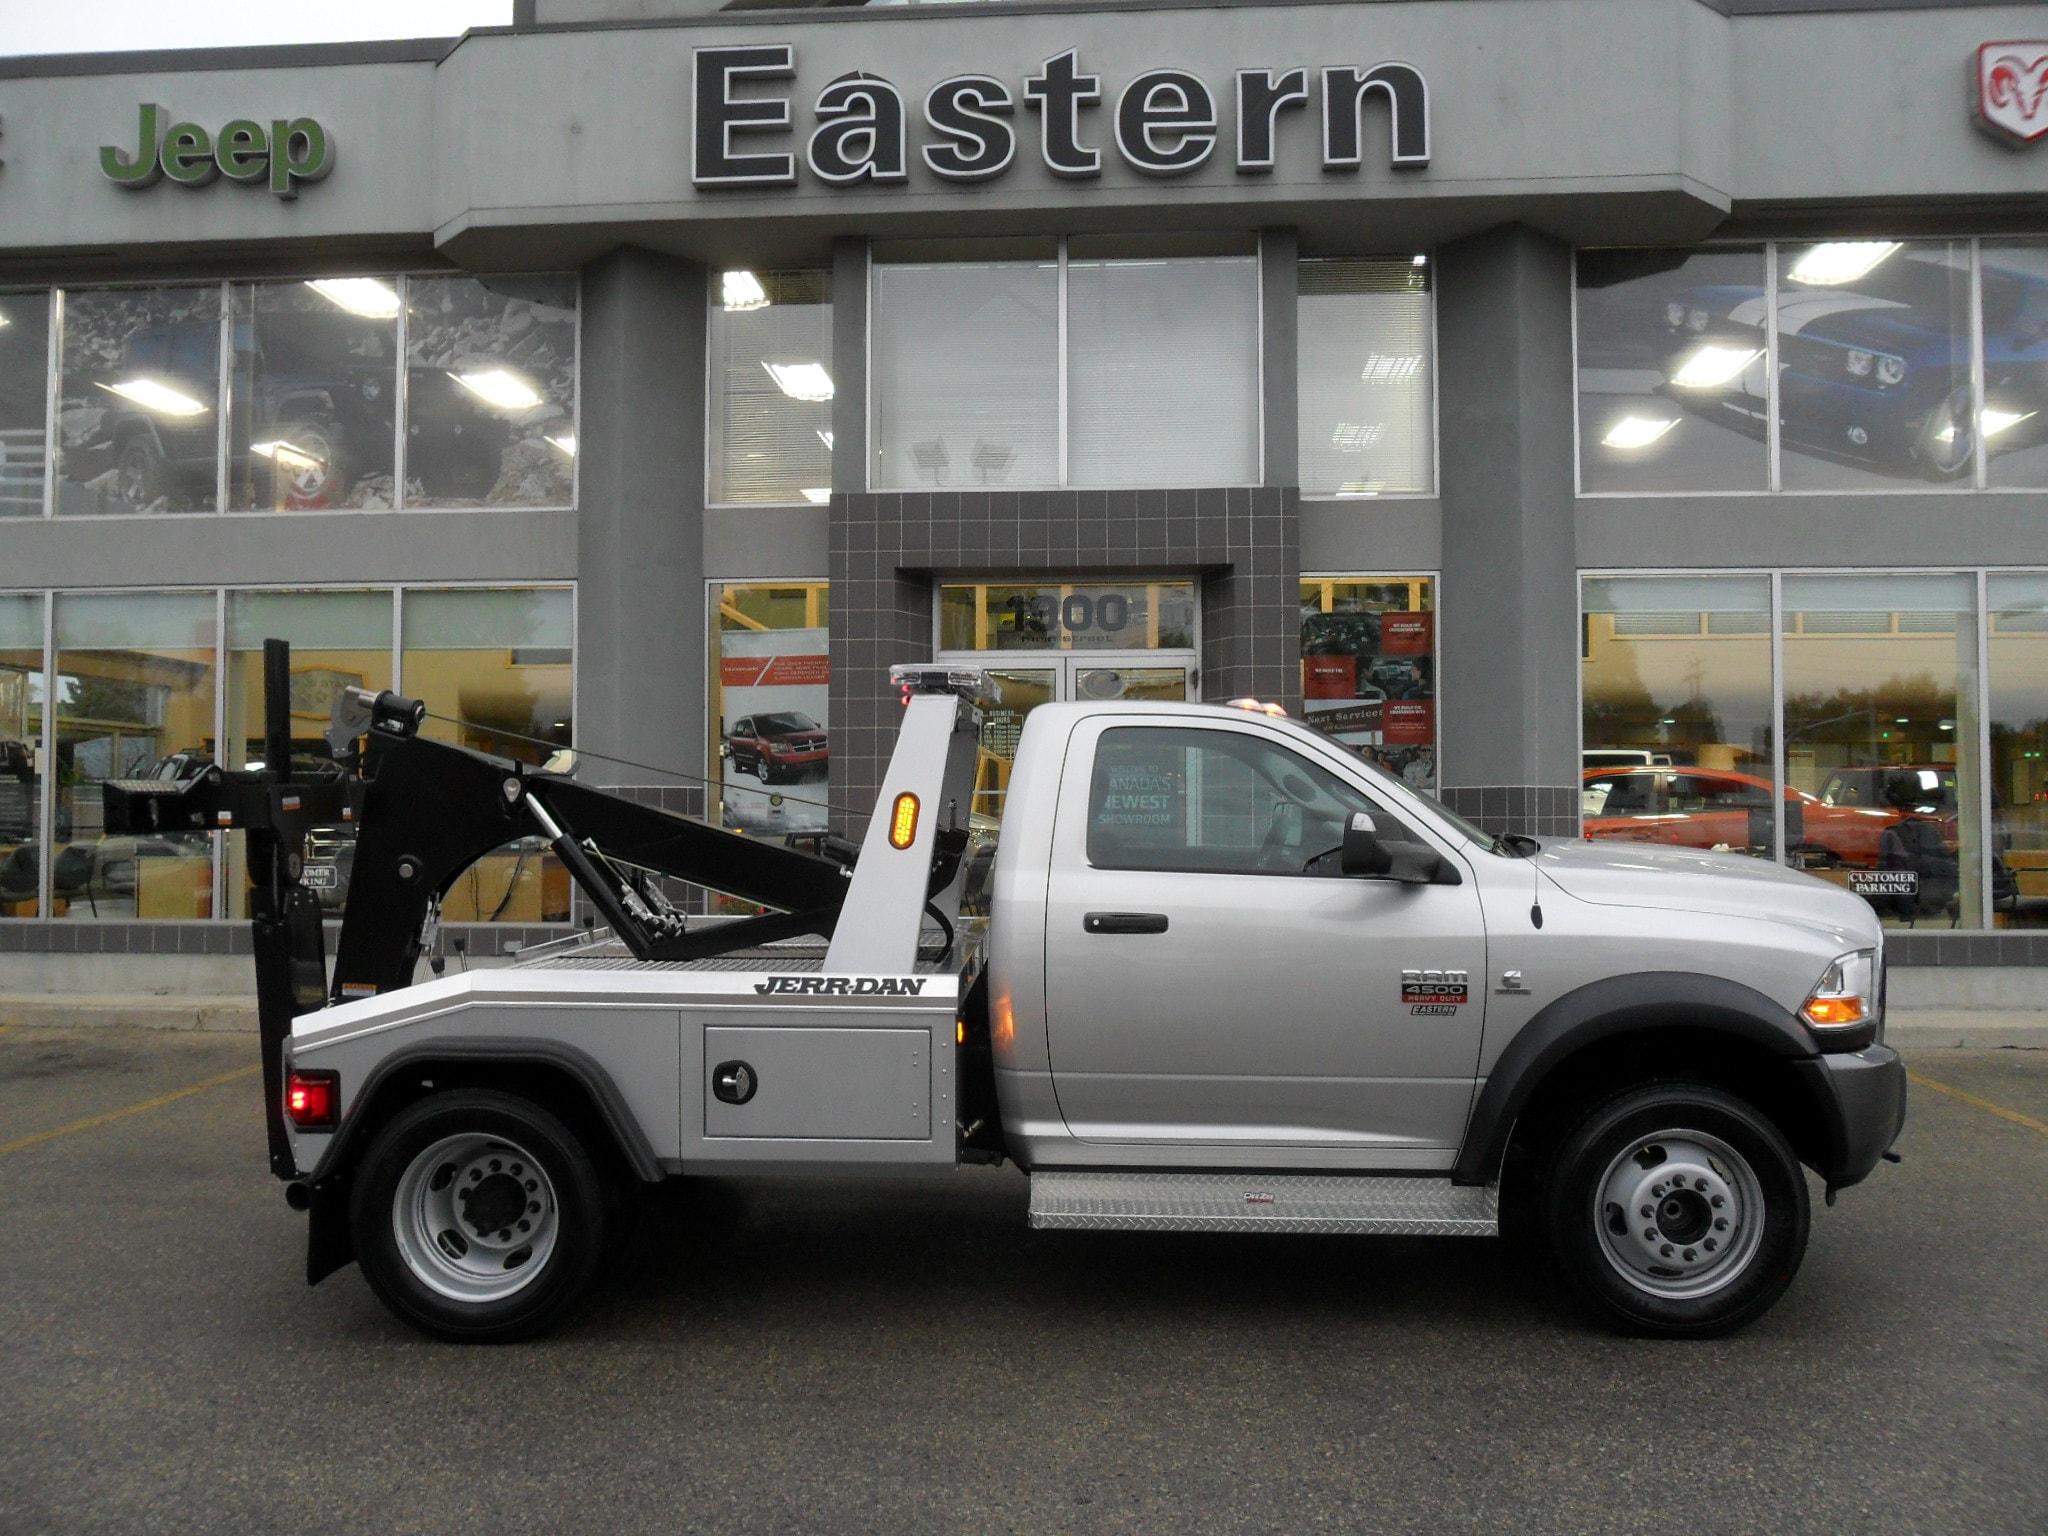 Eastern Dodge Chrysler Jeep Ram   Vehicles for sale in Winnipeg, MB